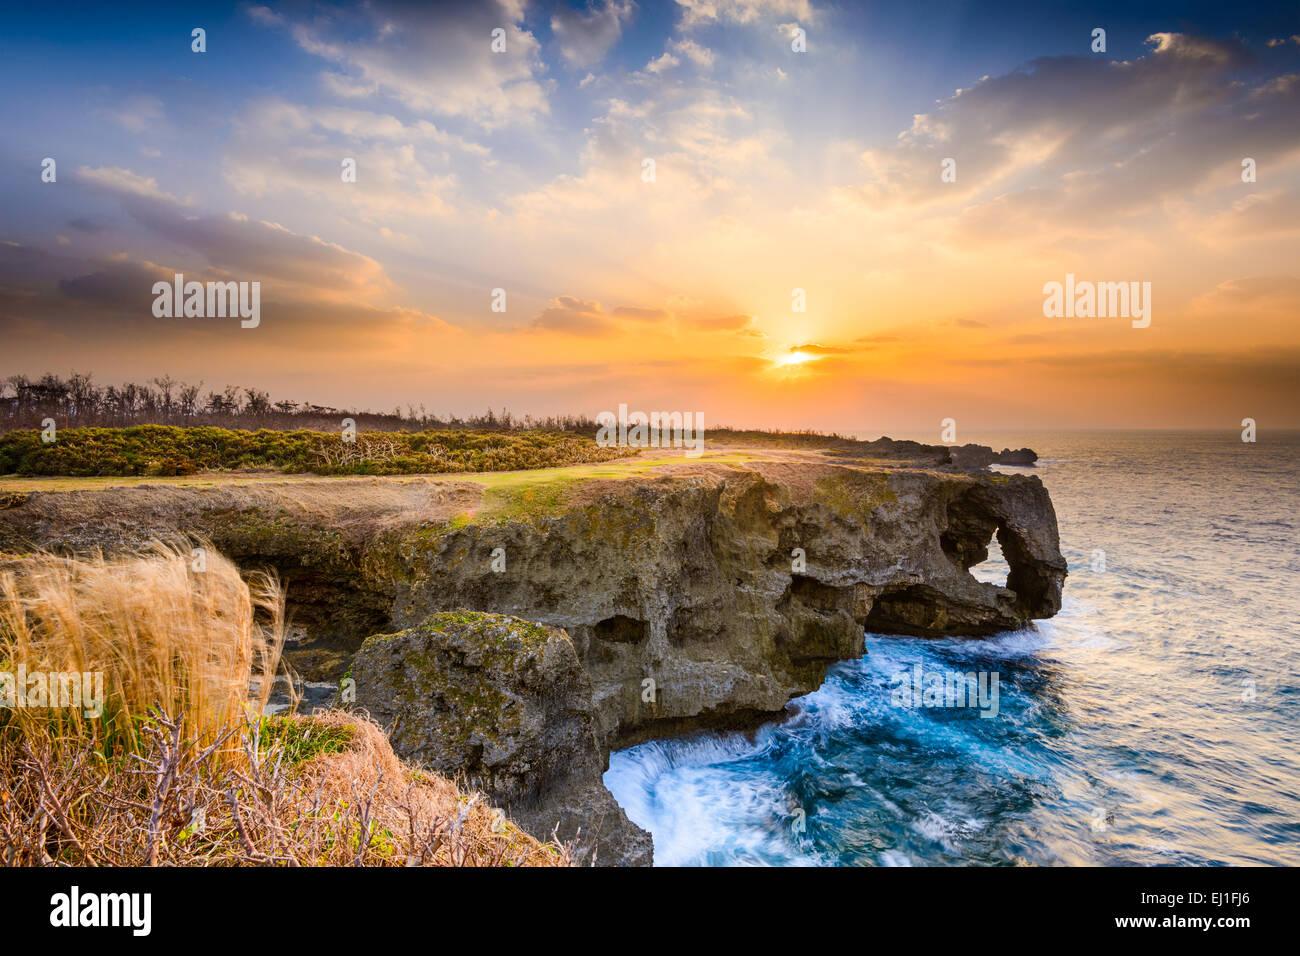 Okinawa, Japan am Kap Manzamo während des Sonnenuntergangs. Stockbild